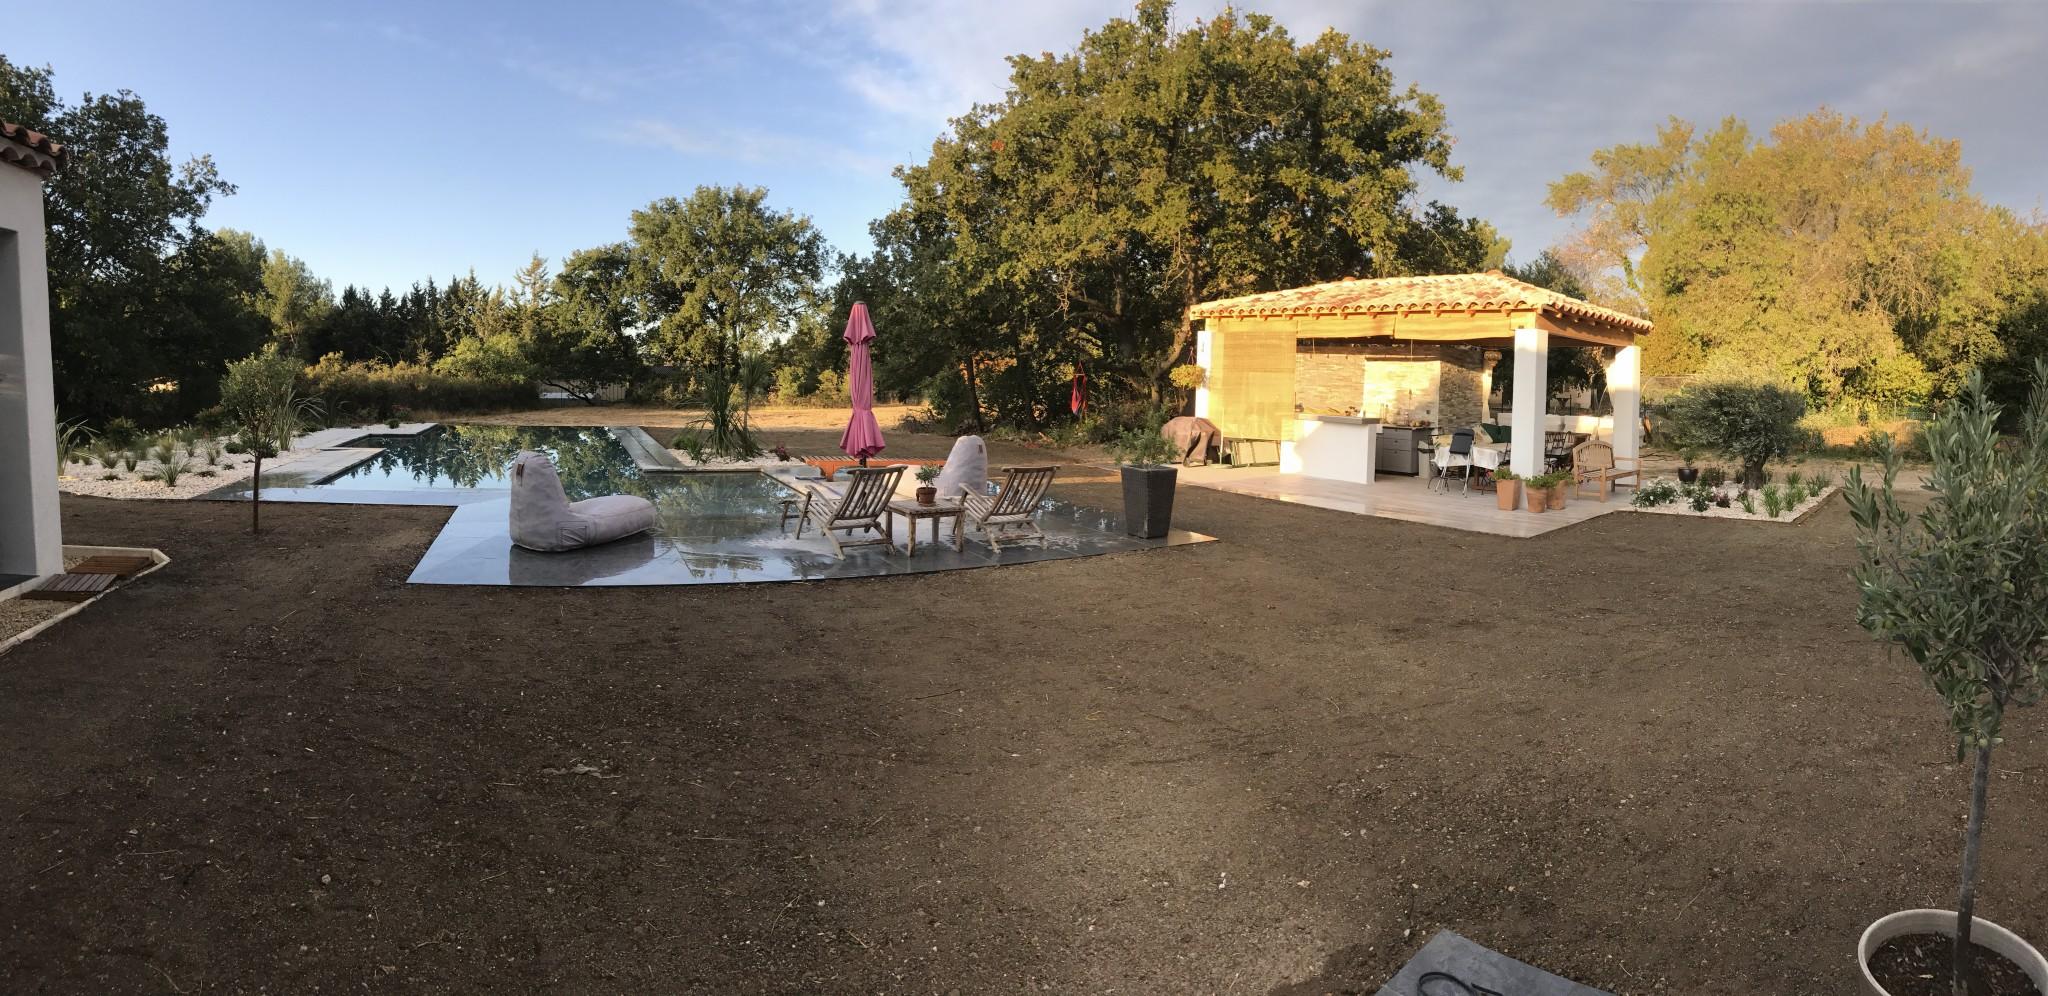 Architecte paysagiste aix en provence jardin contemporain for Architecte paysagiste contemporain